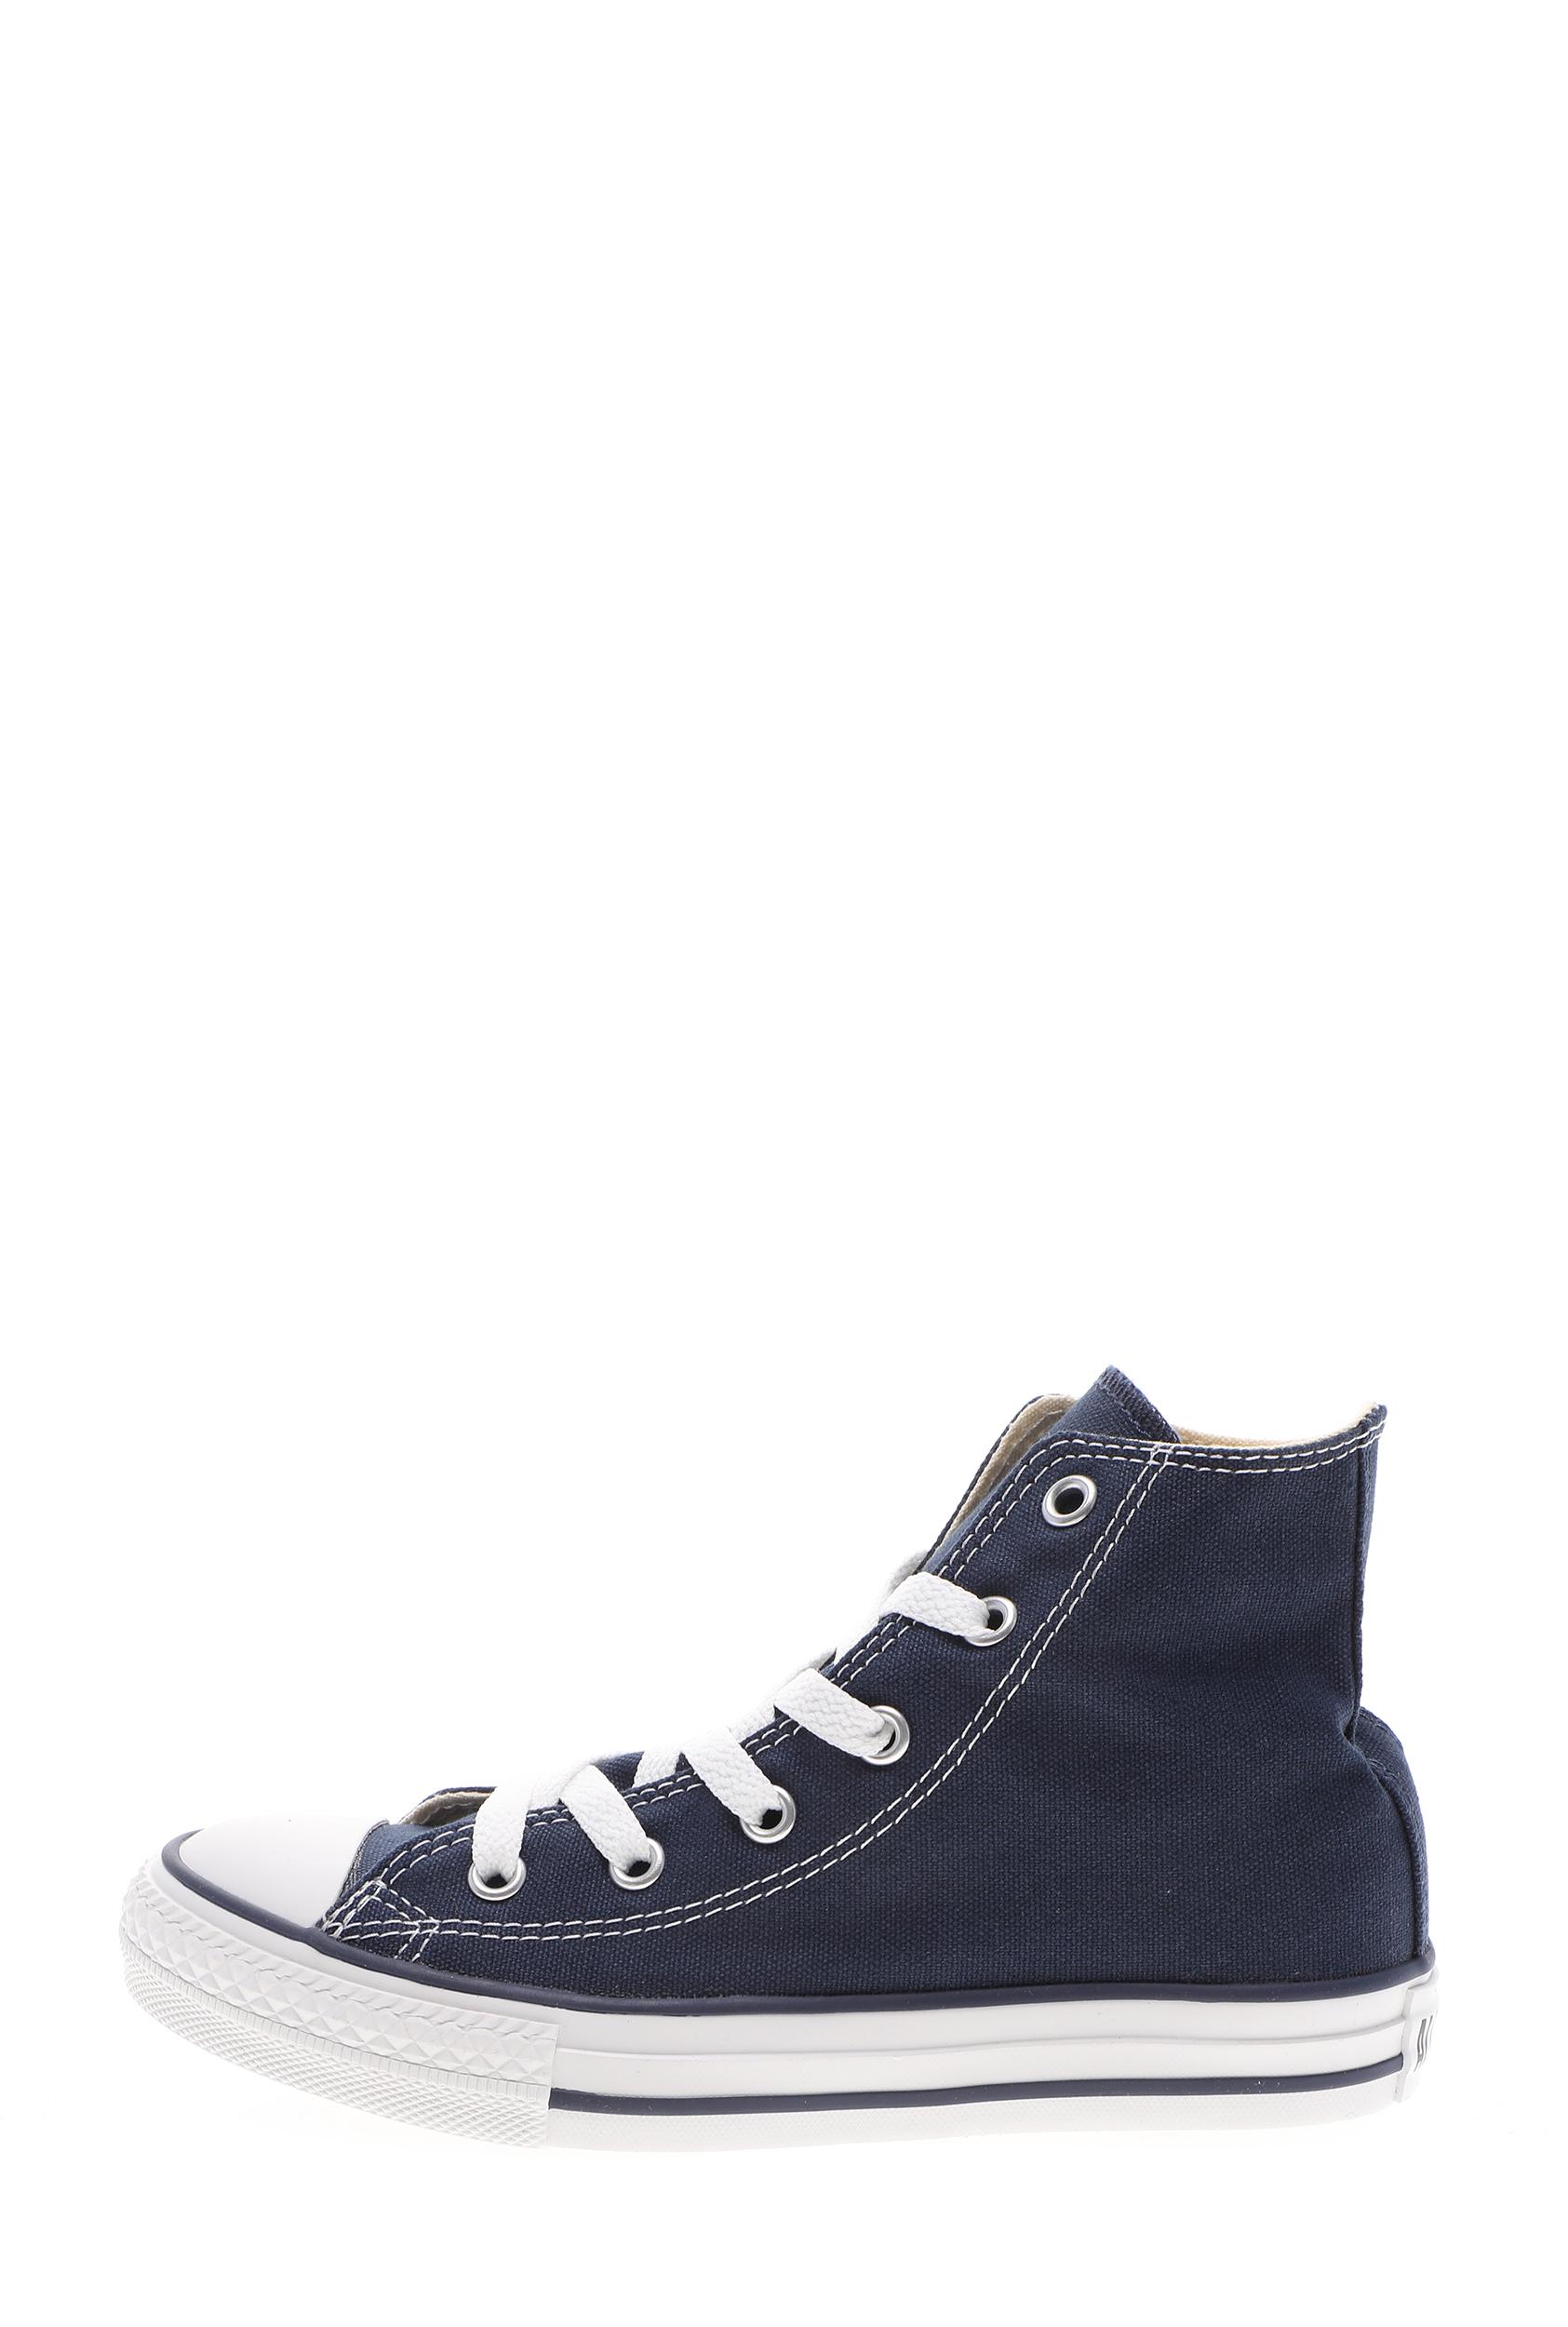 CONVERSE – Παιδικά αθλητικά παπούτσια CONVERSE Chuck Taylor AS Core HI μπλέ